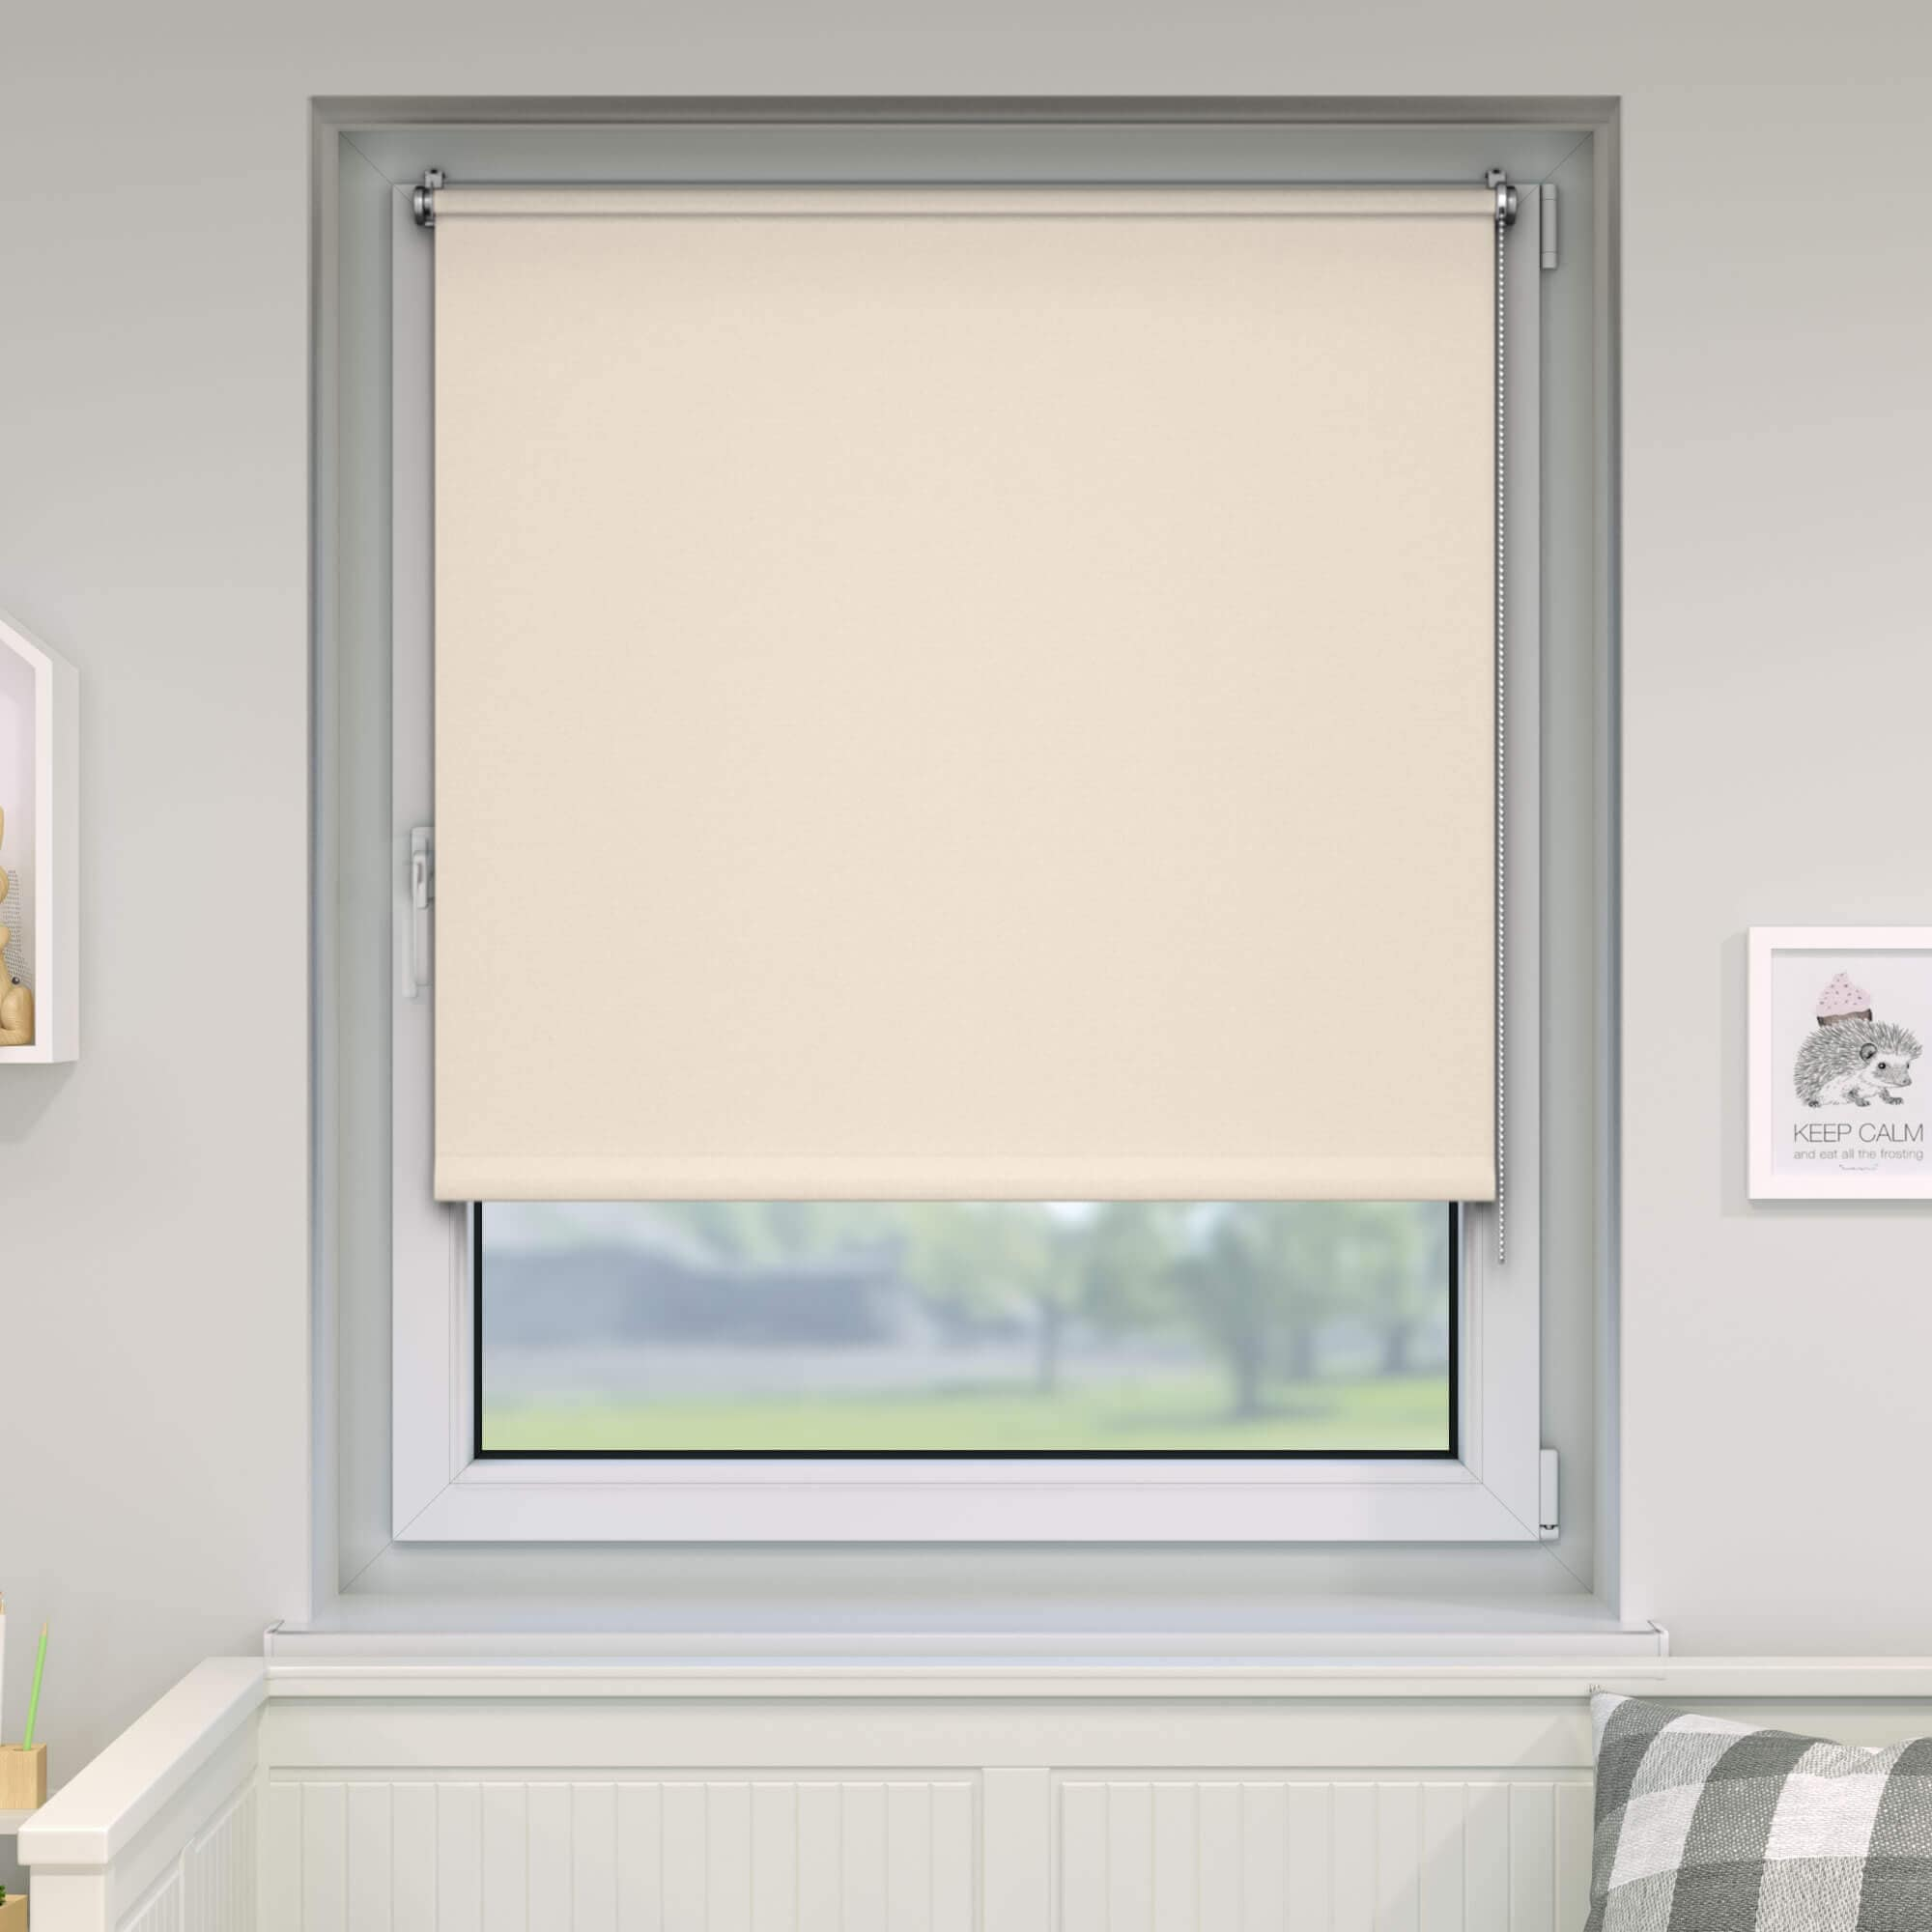 klemmfix verdunkelungsrollo rollo 60 x 150cm creme victoria m standard rollos. Black Bedroom Furniture Sets. Home Design Ideas